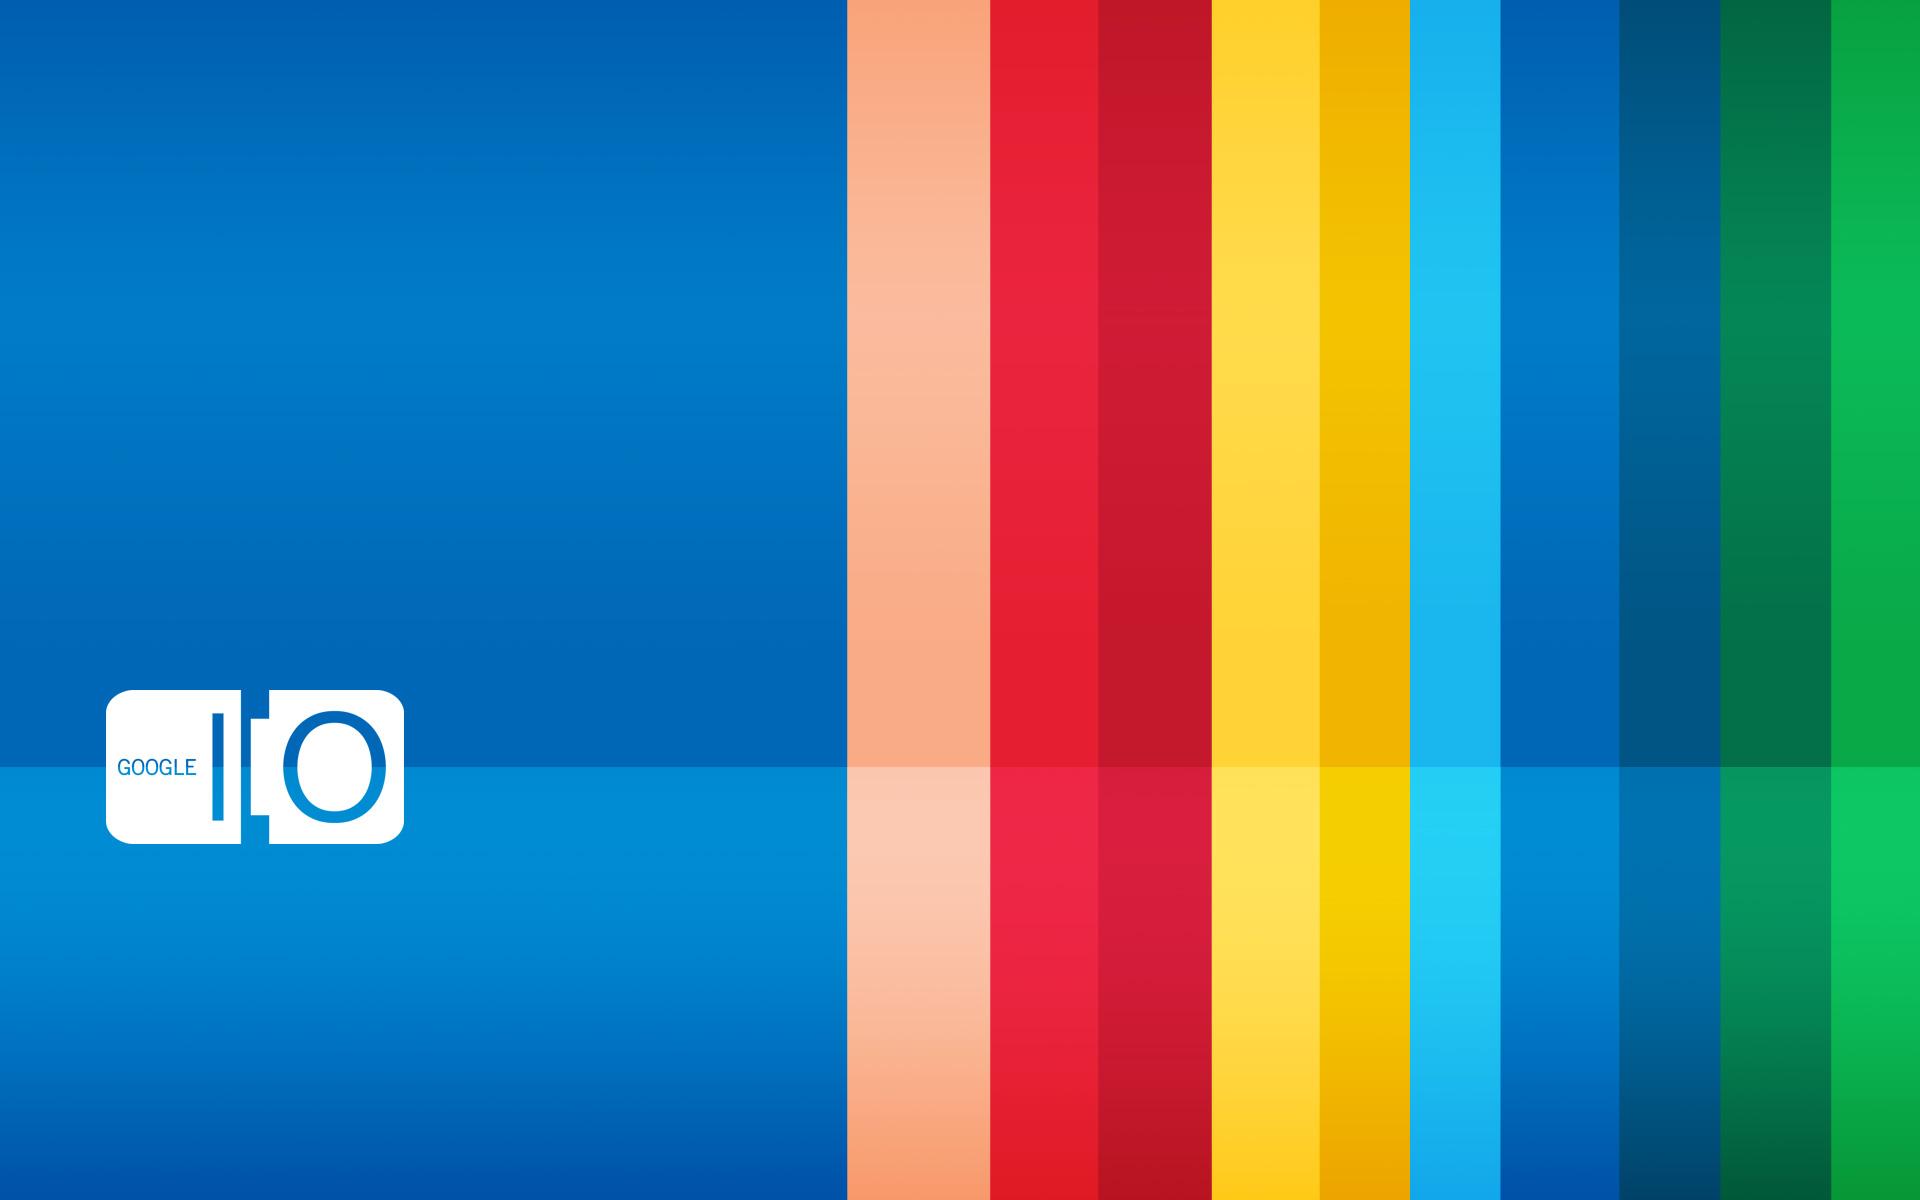 Google Wallpapers Hd Desktop Backgrounds Downloads All Time 1920x1200